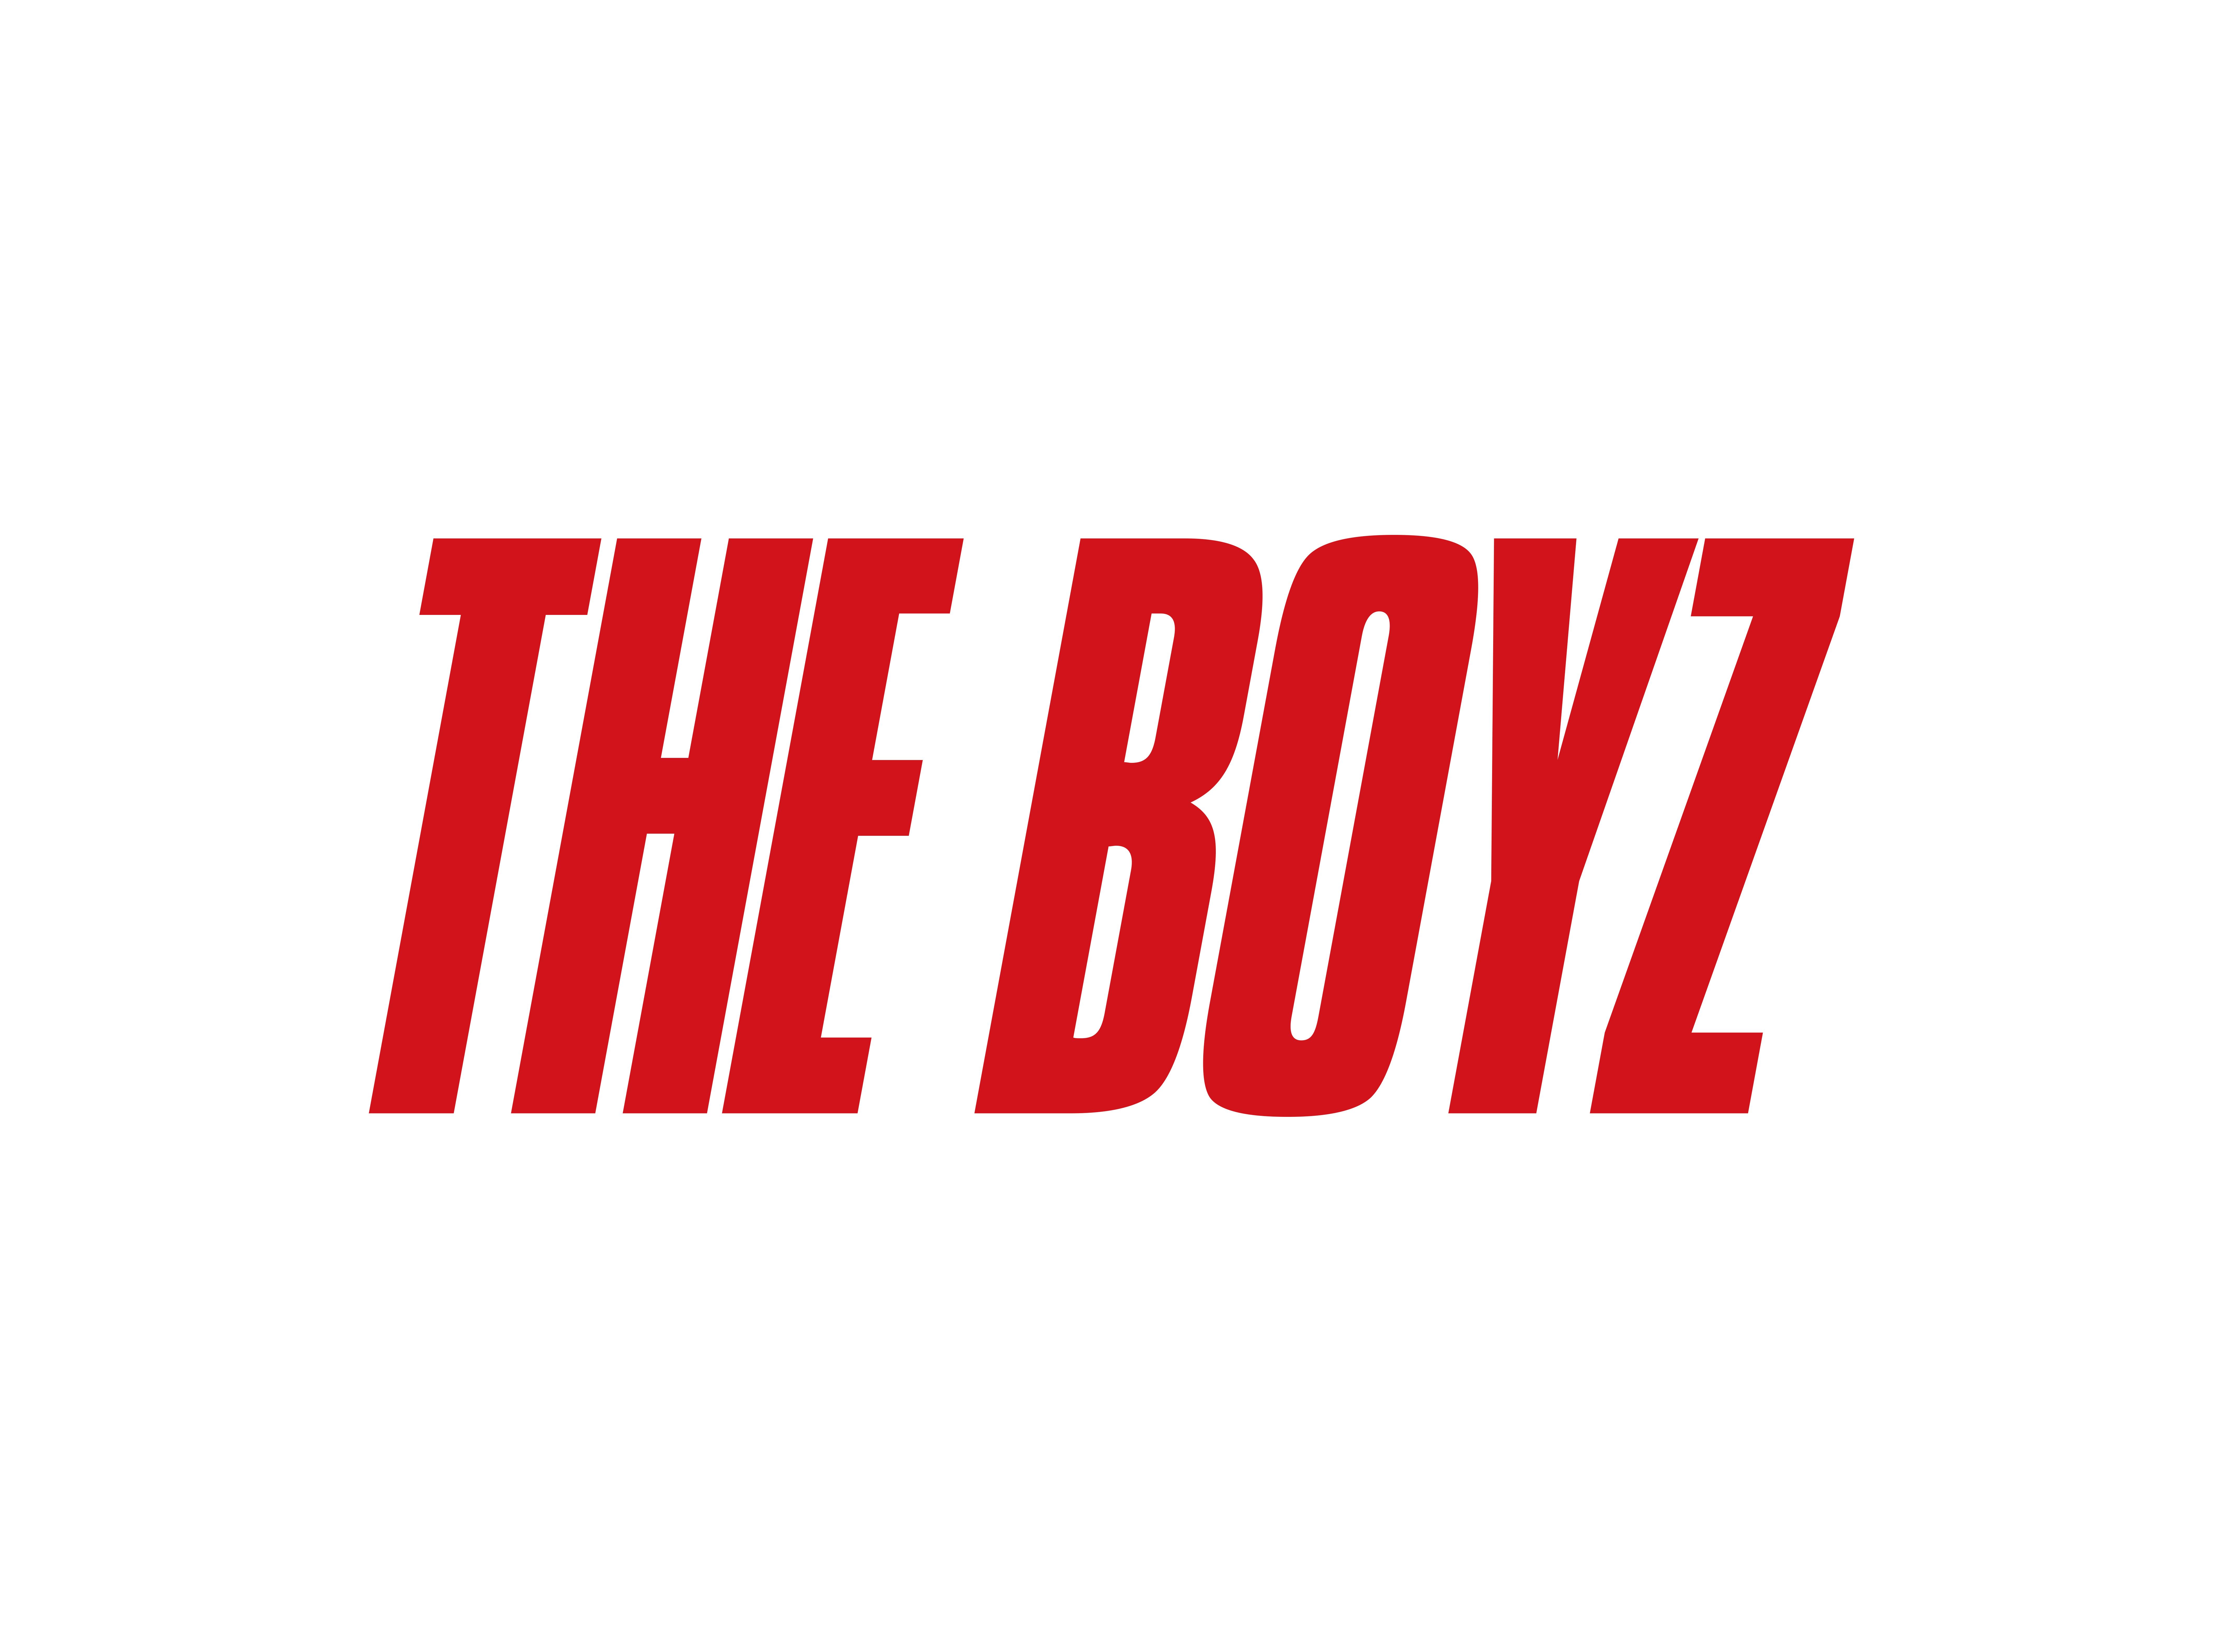 THE BOYZ '하트 공약 이행!'